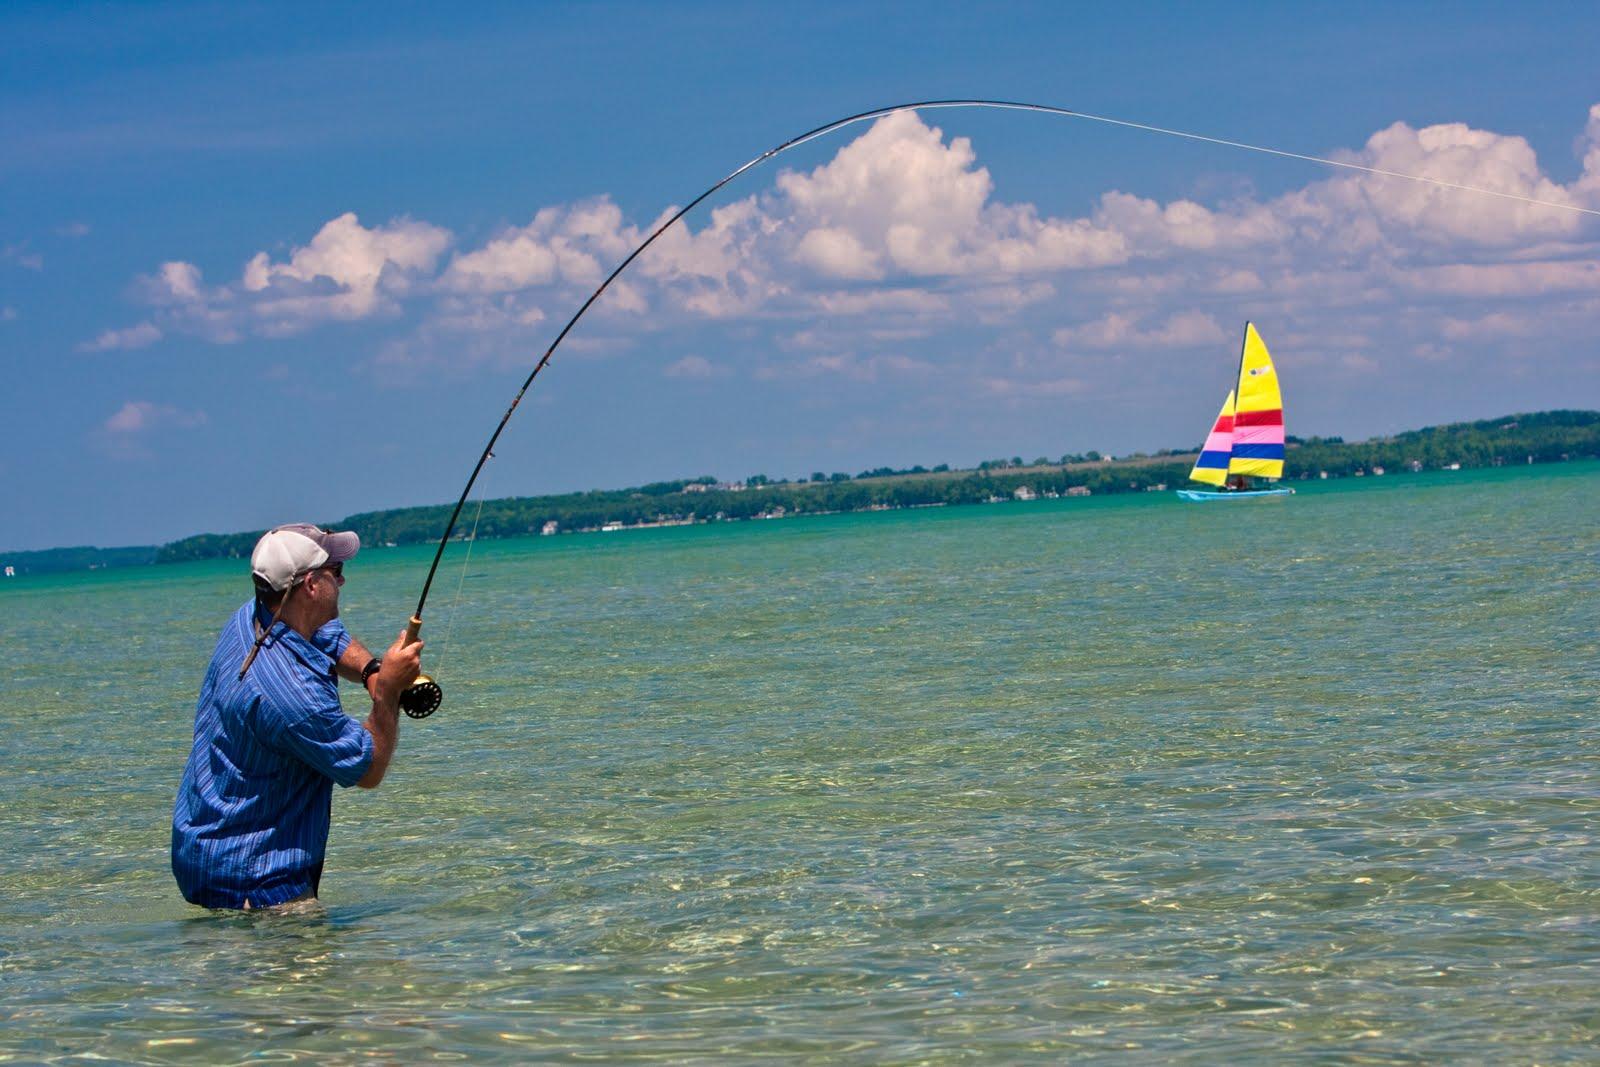 ad39784f38 Grand Traverse Bay Carp – Mangled Fly  Fly Fishing Images